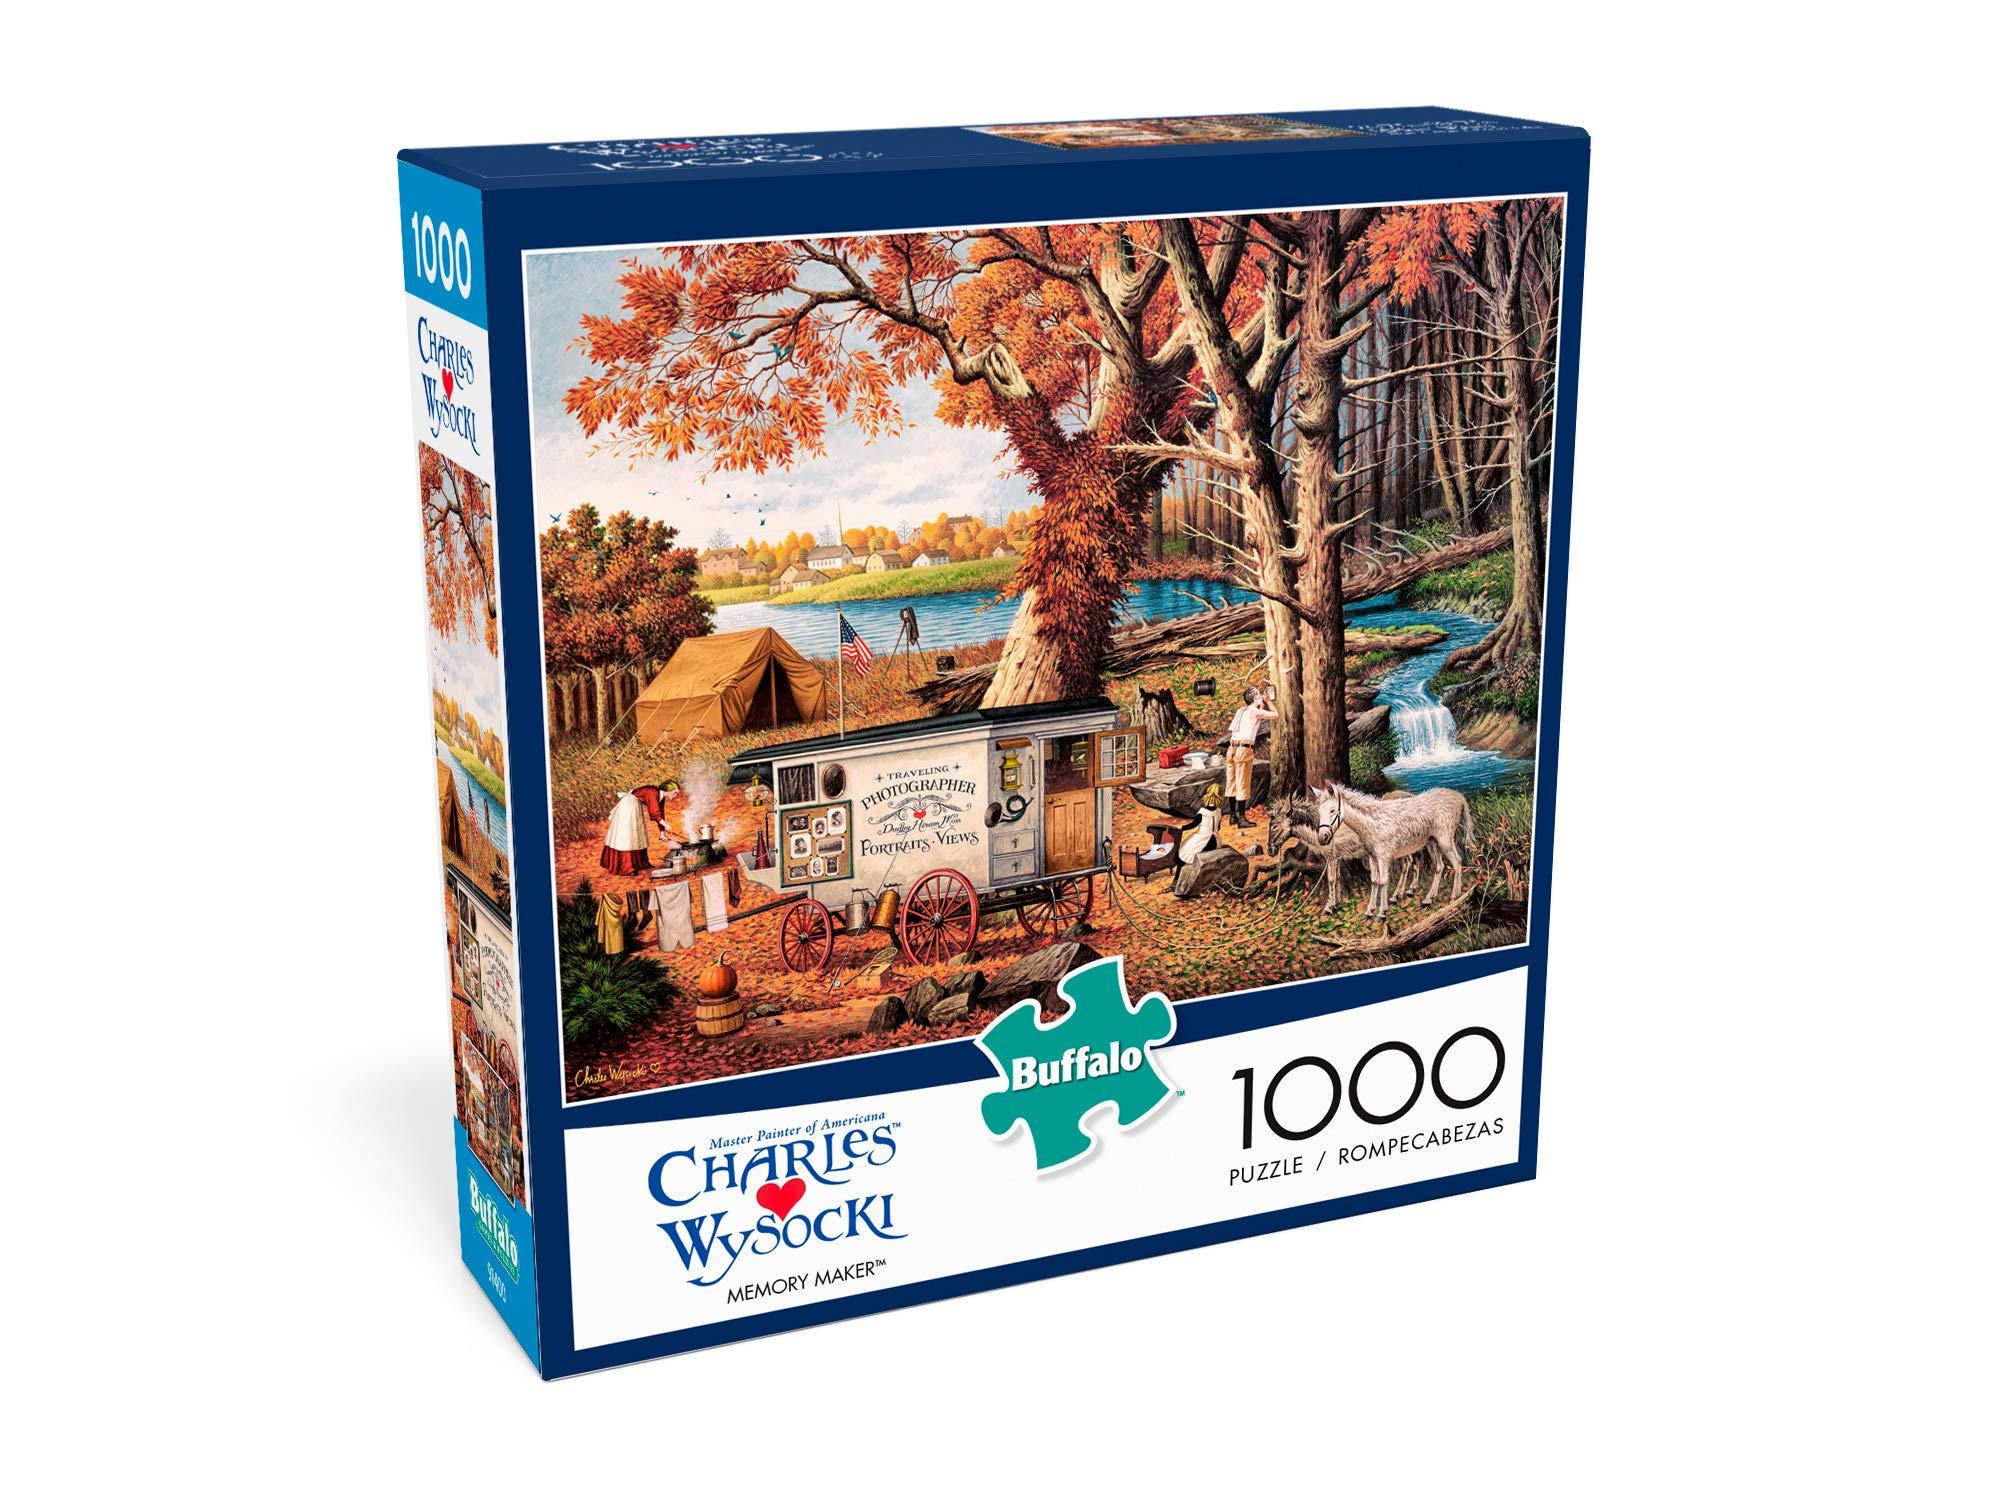 1000 Piece Jigsaw Puzzle Memory Maker Buffalo Games Charles Wysocki